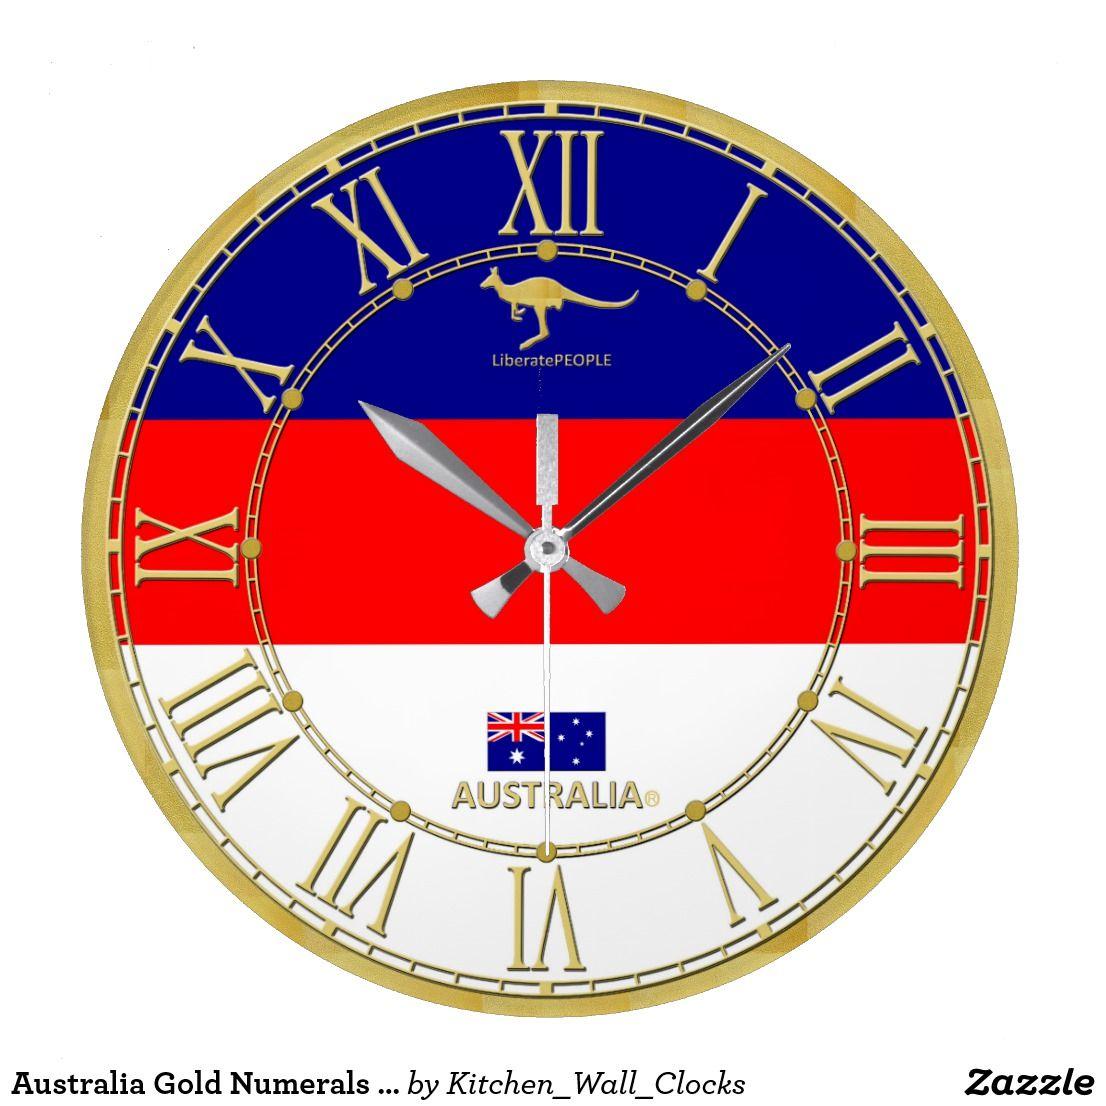 Australia gold numerals modern wall clock gift httpszazzle australia gold numerals modern wall clock gift httpszazzle amipublicfo Image collections